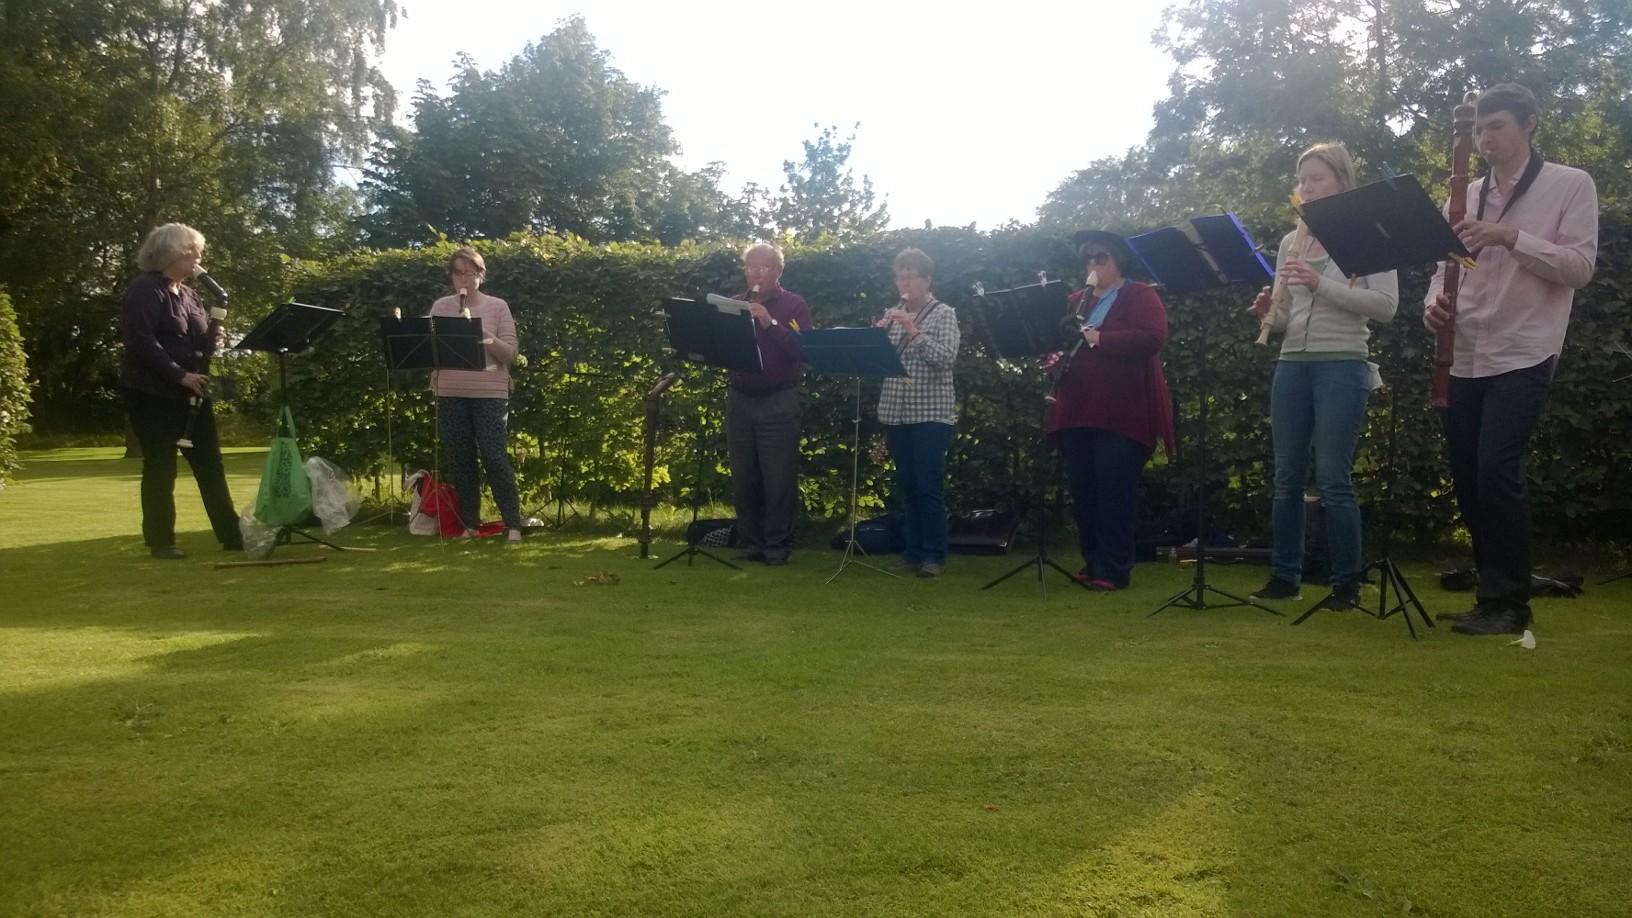 Elizabethan Music ensemble supporting the Handlebards performance at Felton Park.